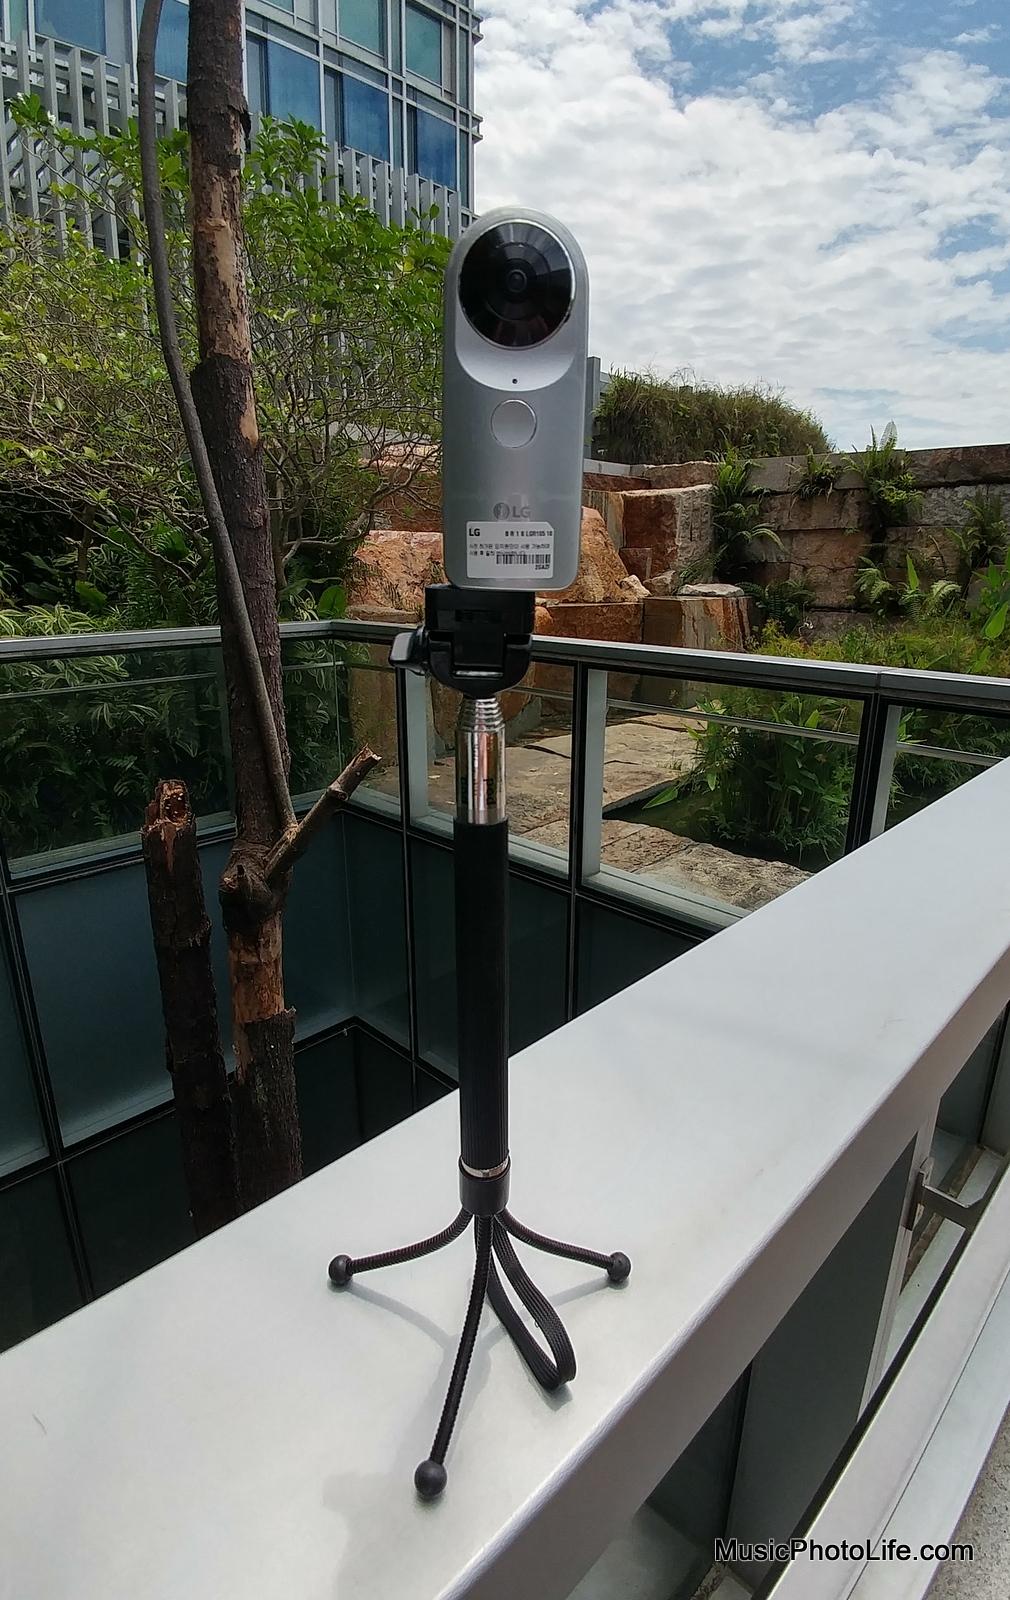 LG 360 CAM on monopod